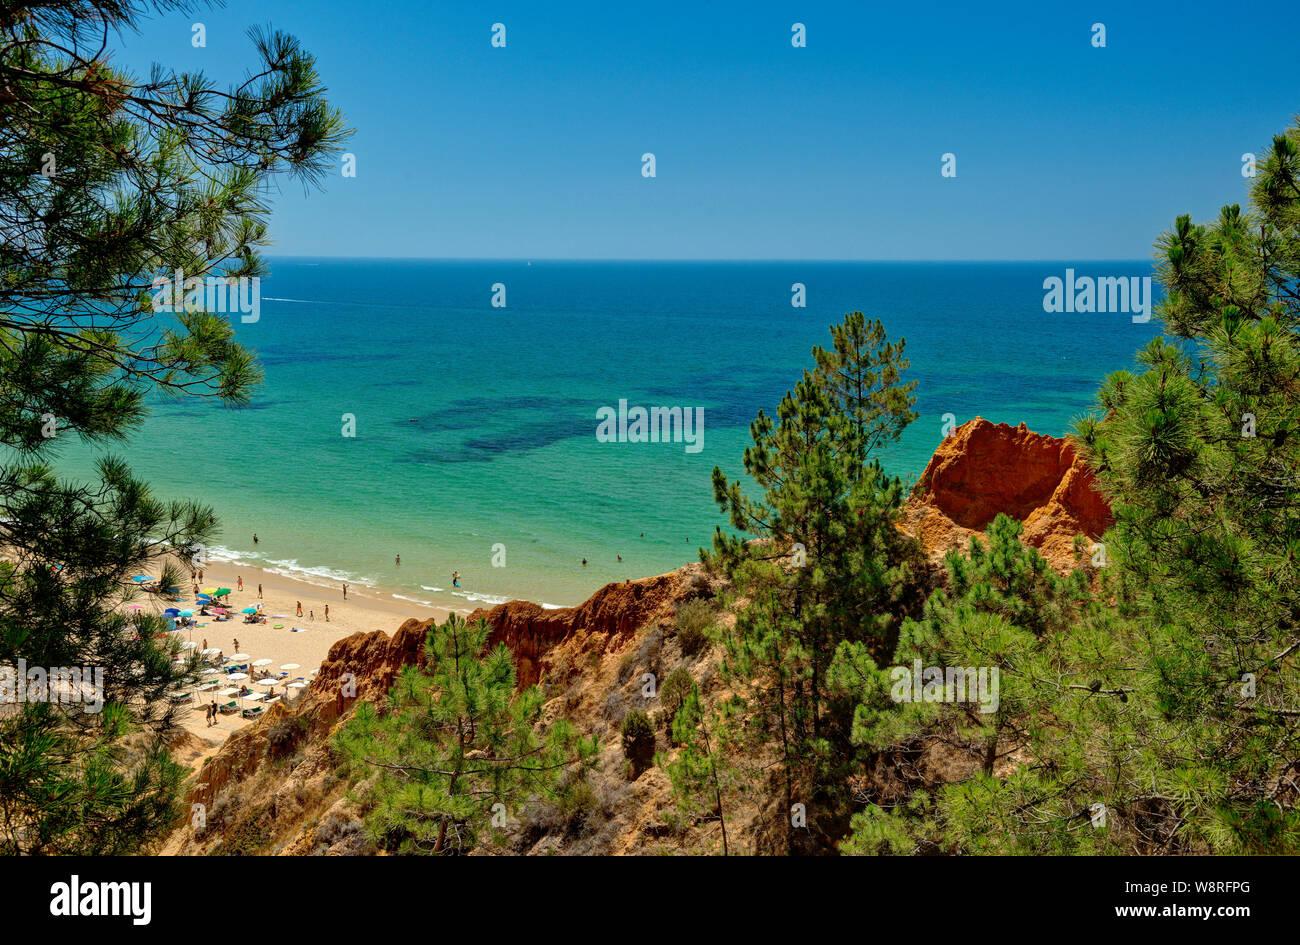 Praia da Falésia, Algarve, Portugal Banque D'Images